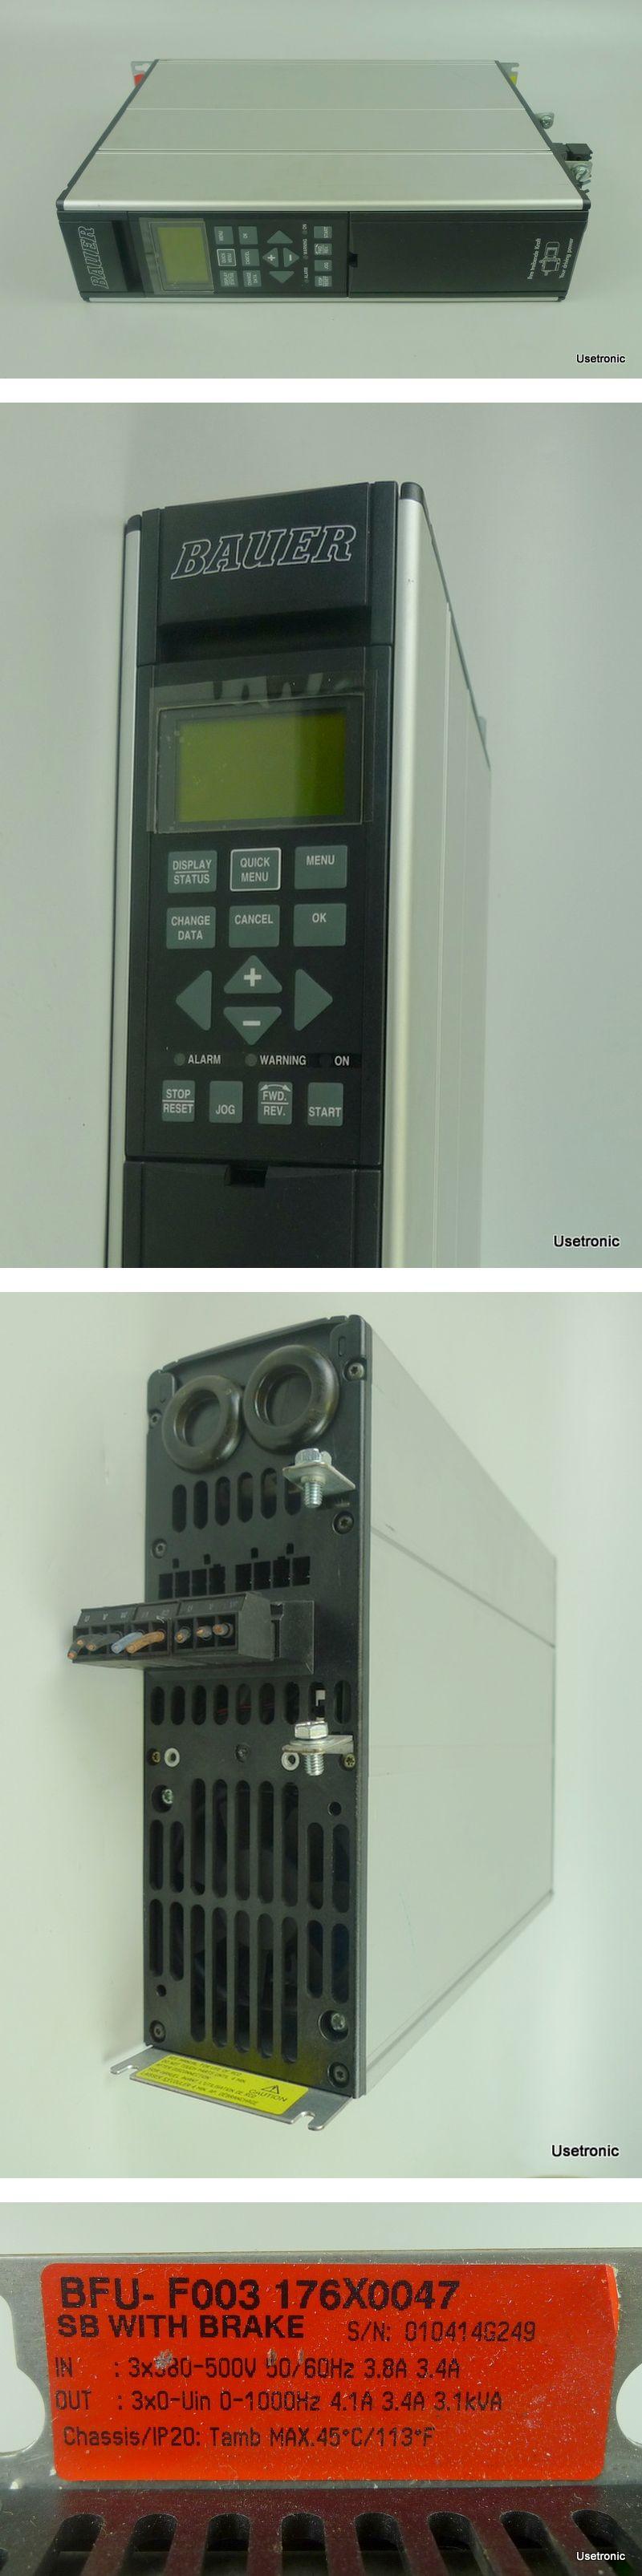 Bauer BFU-F003 Frequenzumrichter 0-1000Hz 3,1 kVA 176X0047